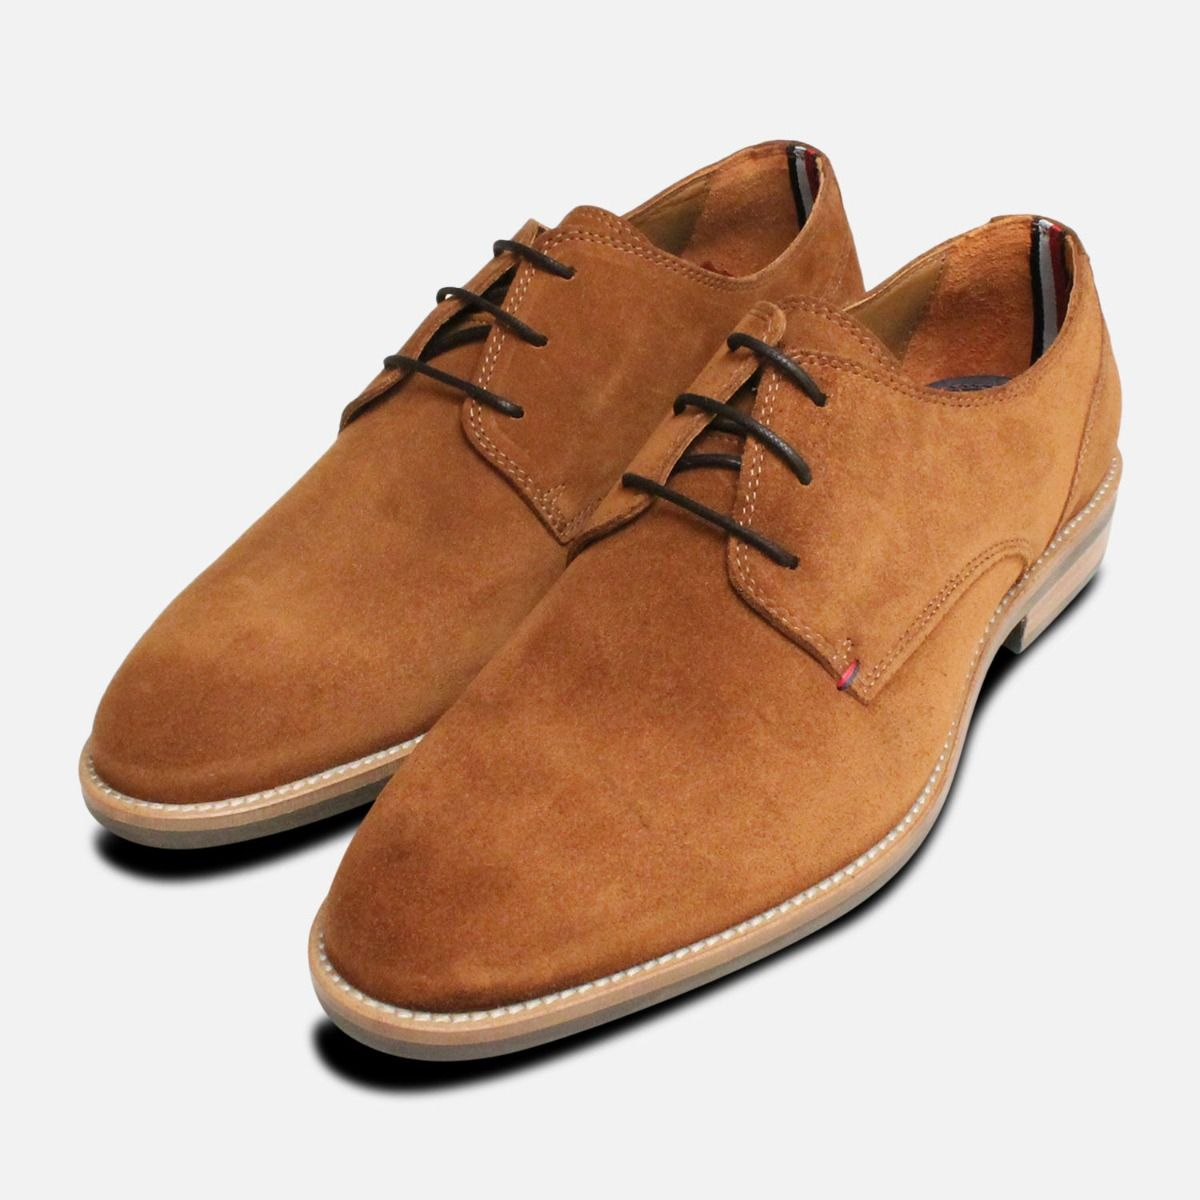 e66e04b8b2ab Tommy Hilfiger Cognac Suede Mens Daytona Shoes